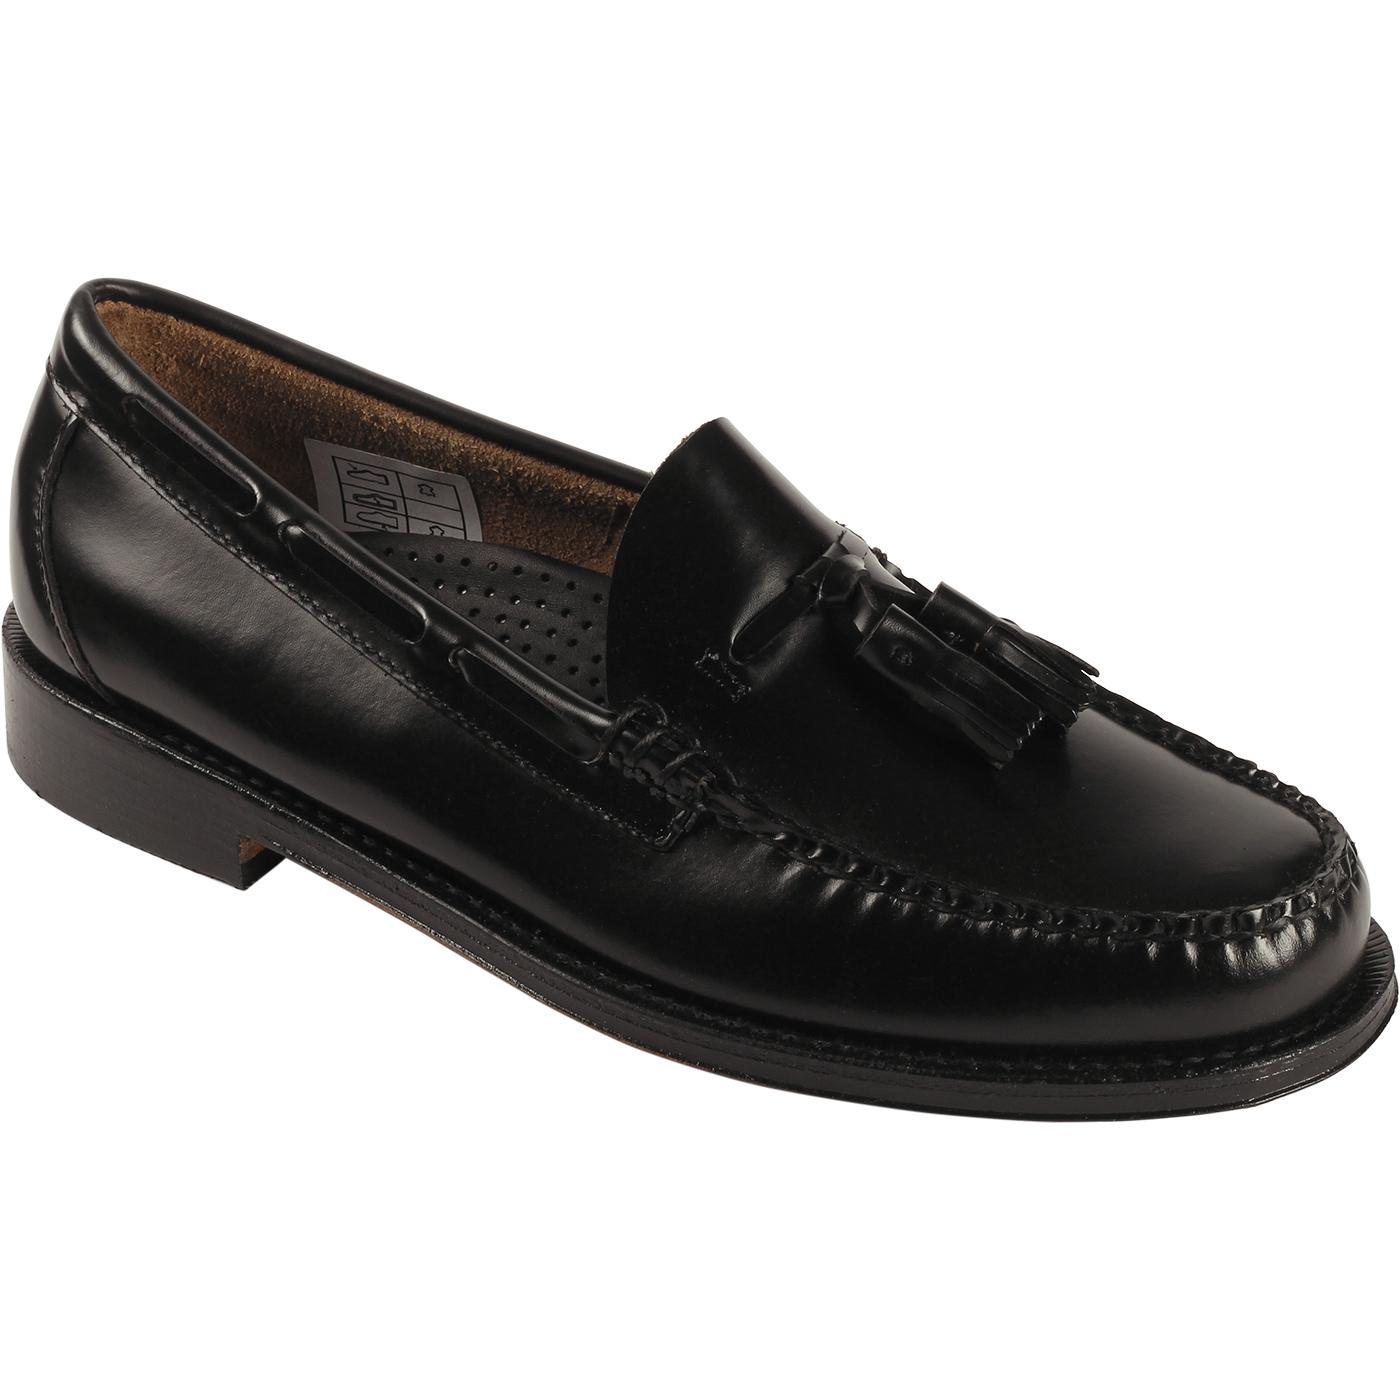 Heritage Larkin BASS WEEJUNS Tassel Loafers BLACK